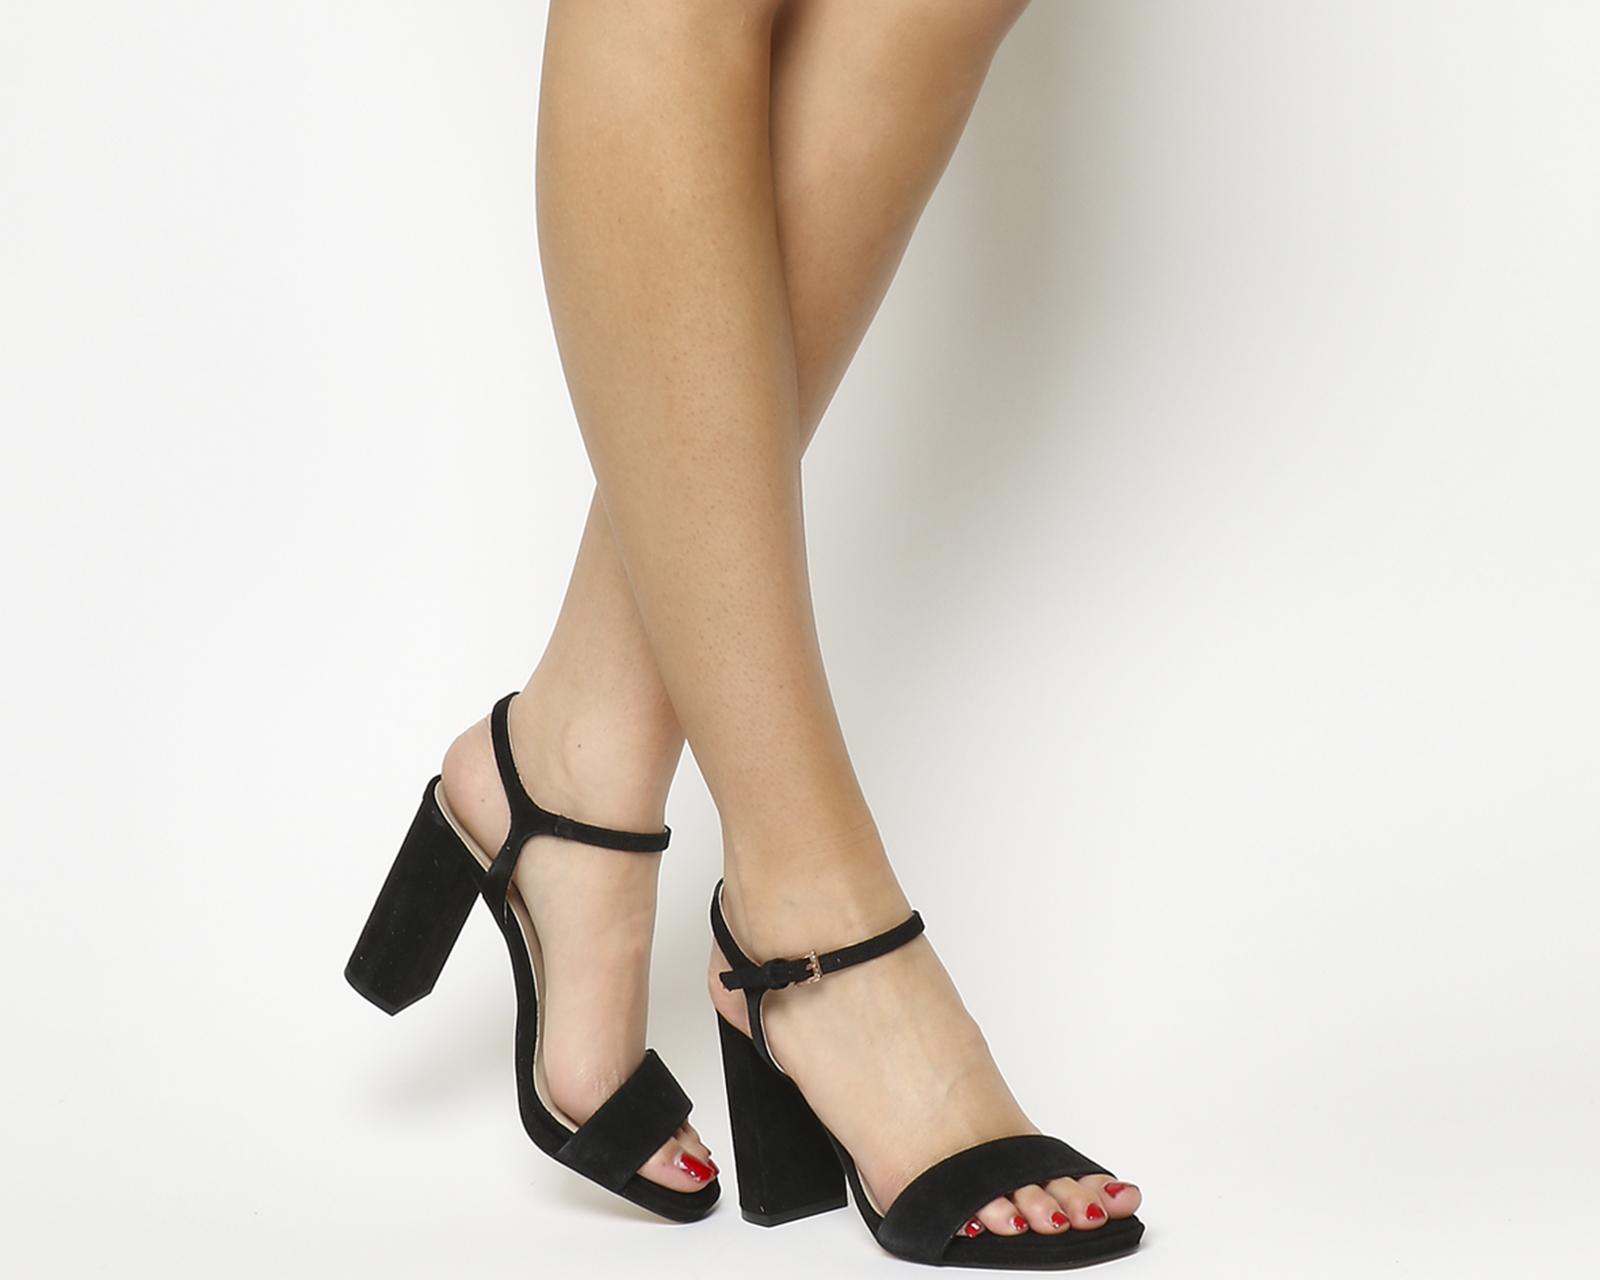 4e7f469114e Sentinel Womens Office Hazzard Slim Platform Sandals Black Suede Heels